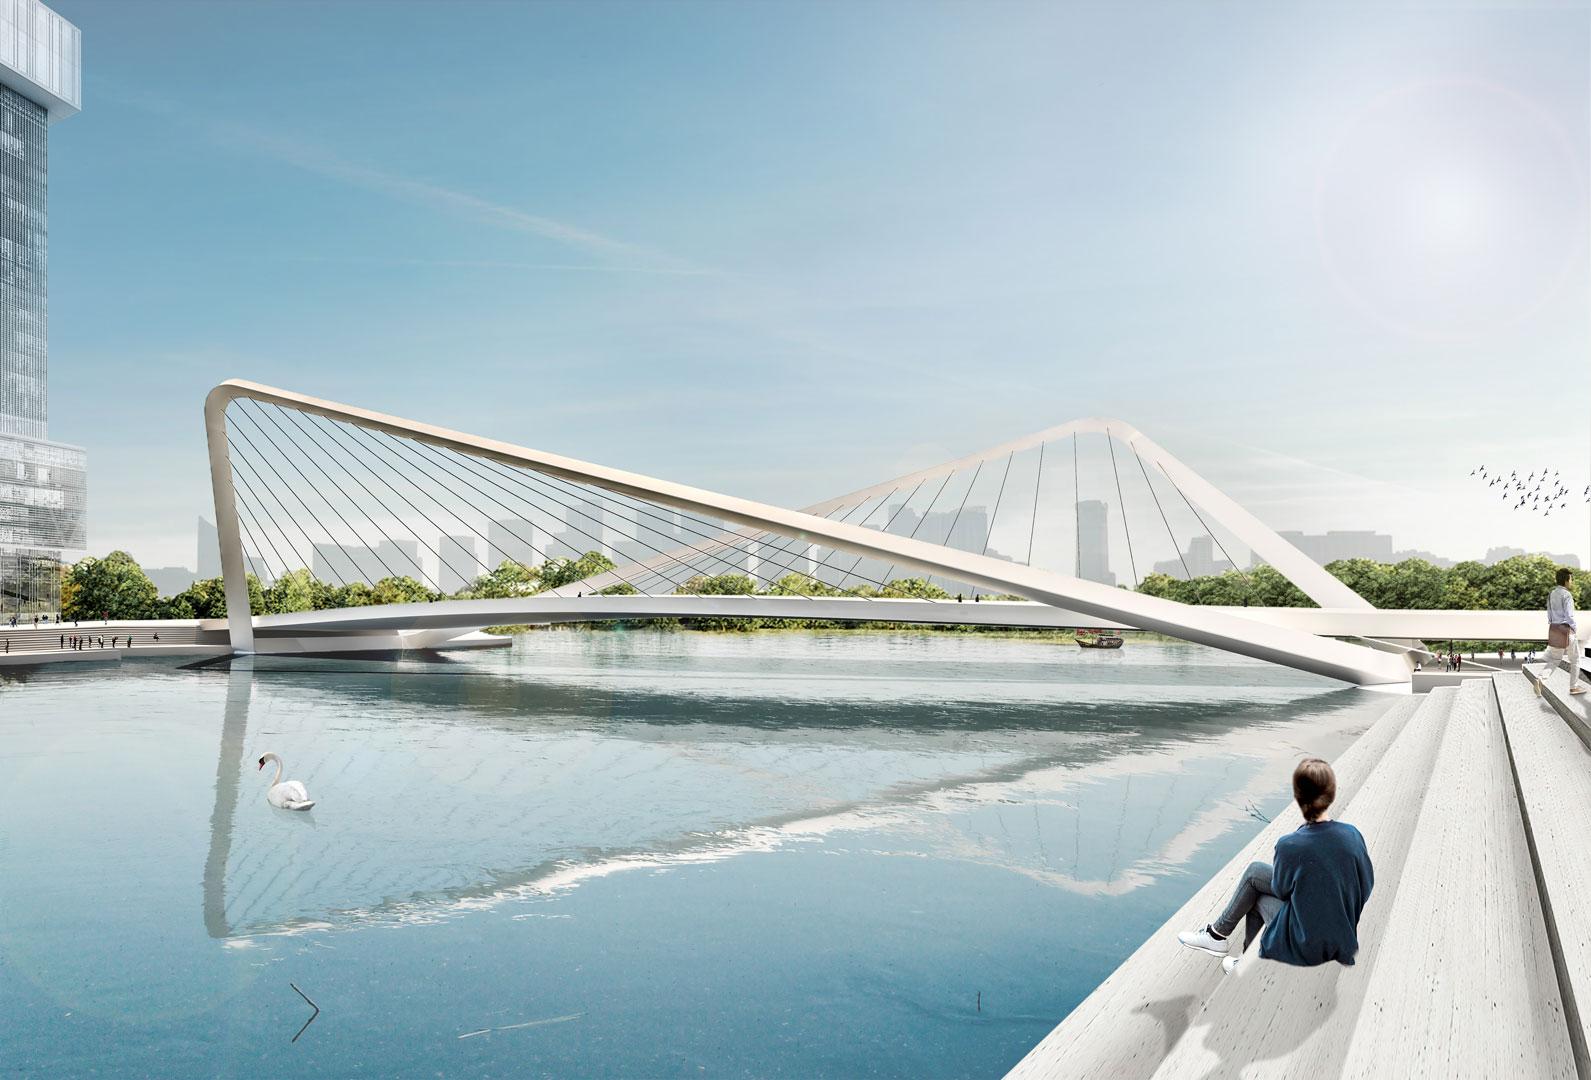 Visualization Hangzhou Bridges Day